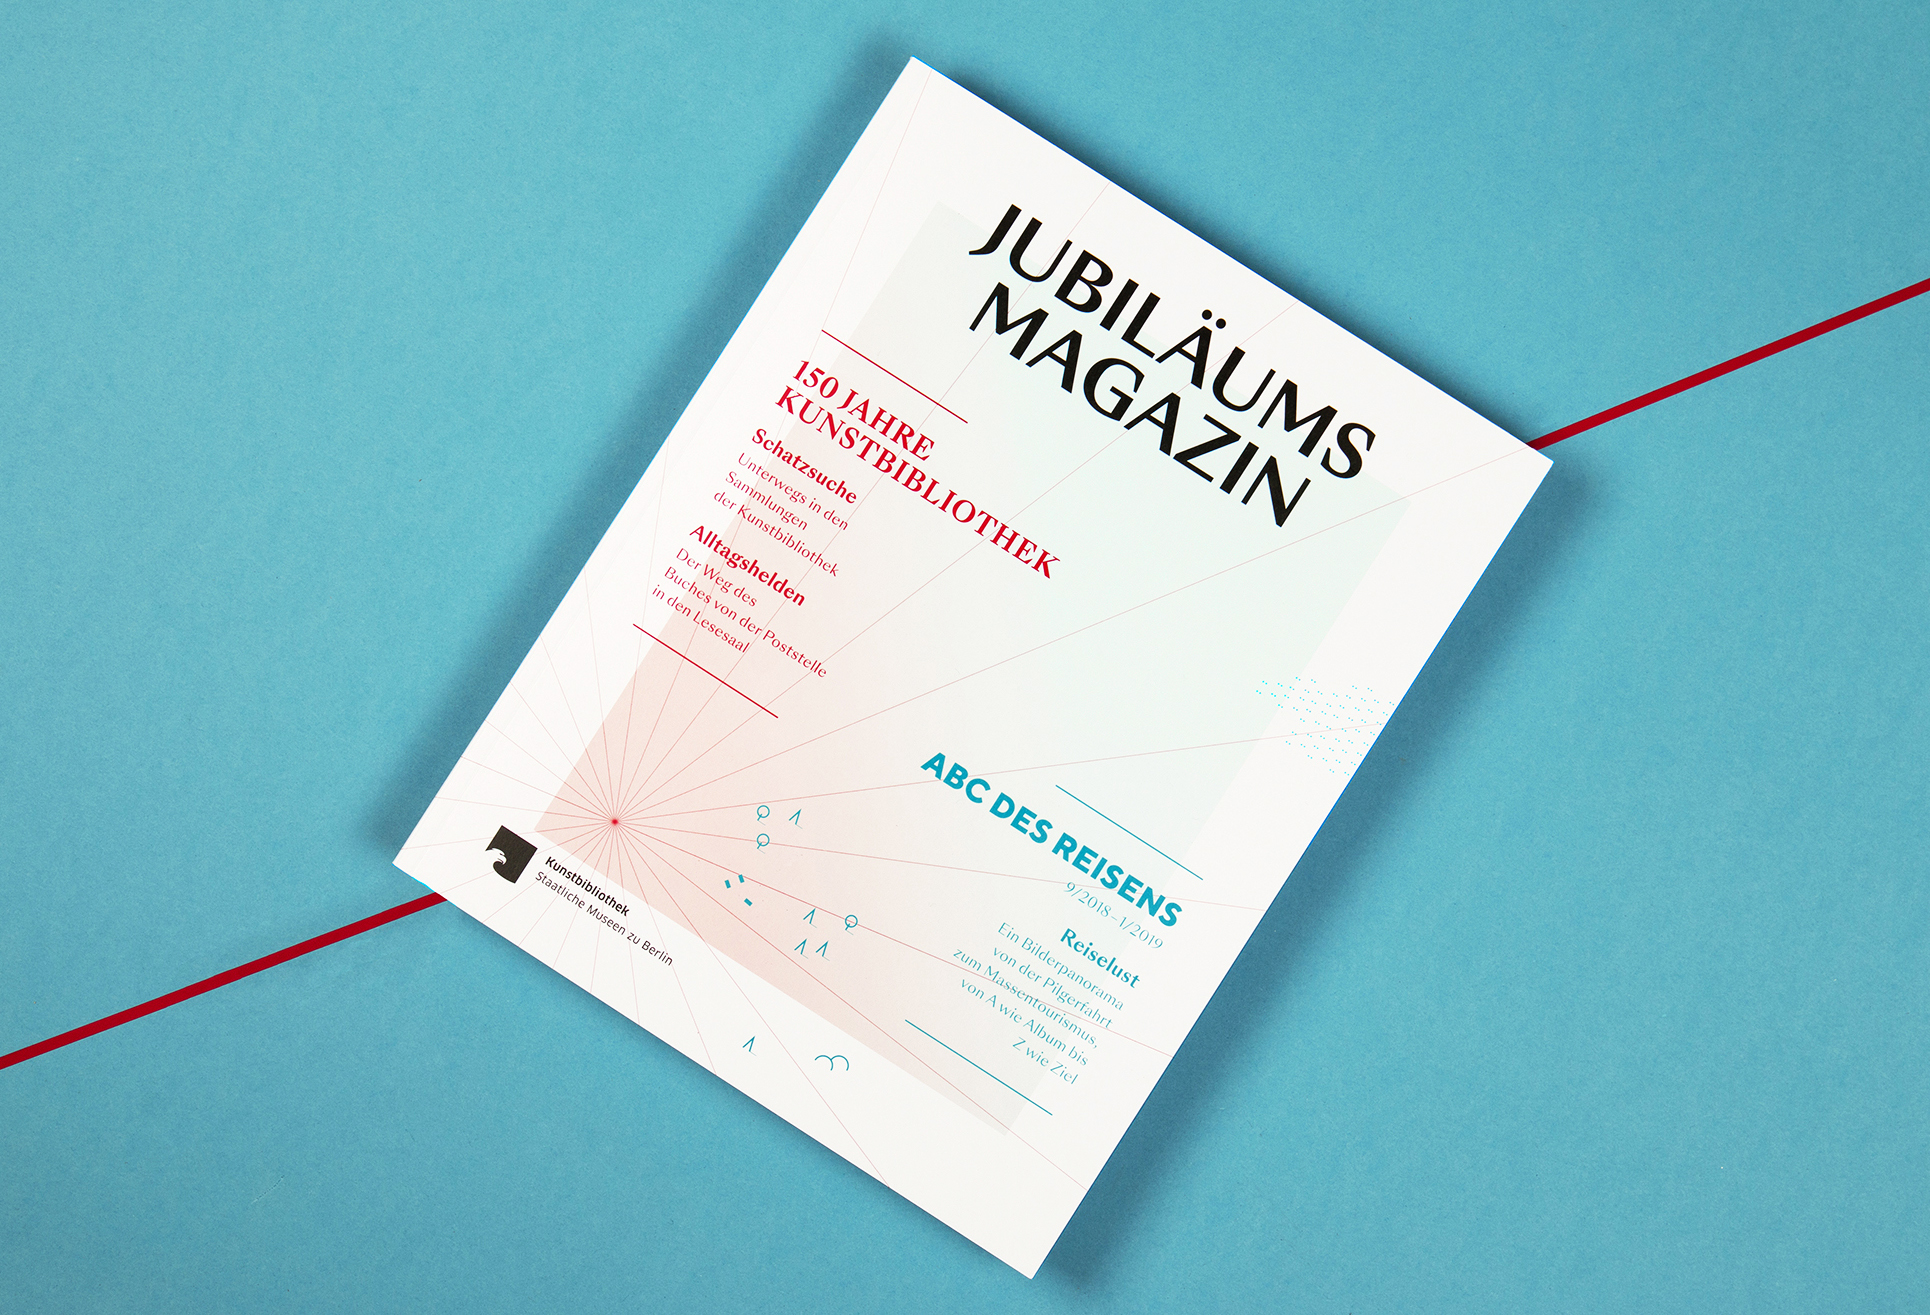 Jubiläumsmagazin »ABC des Reisens«